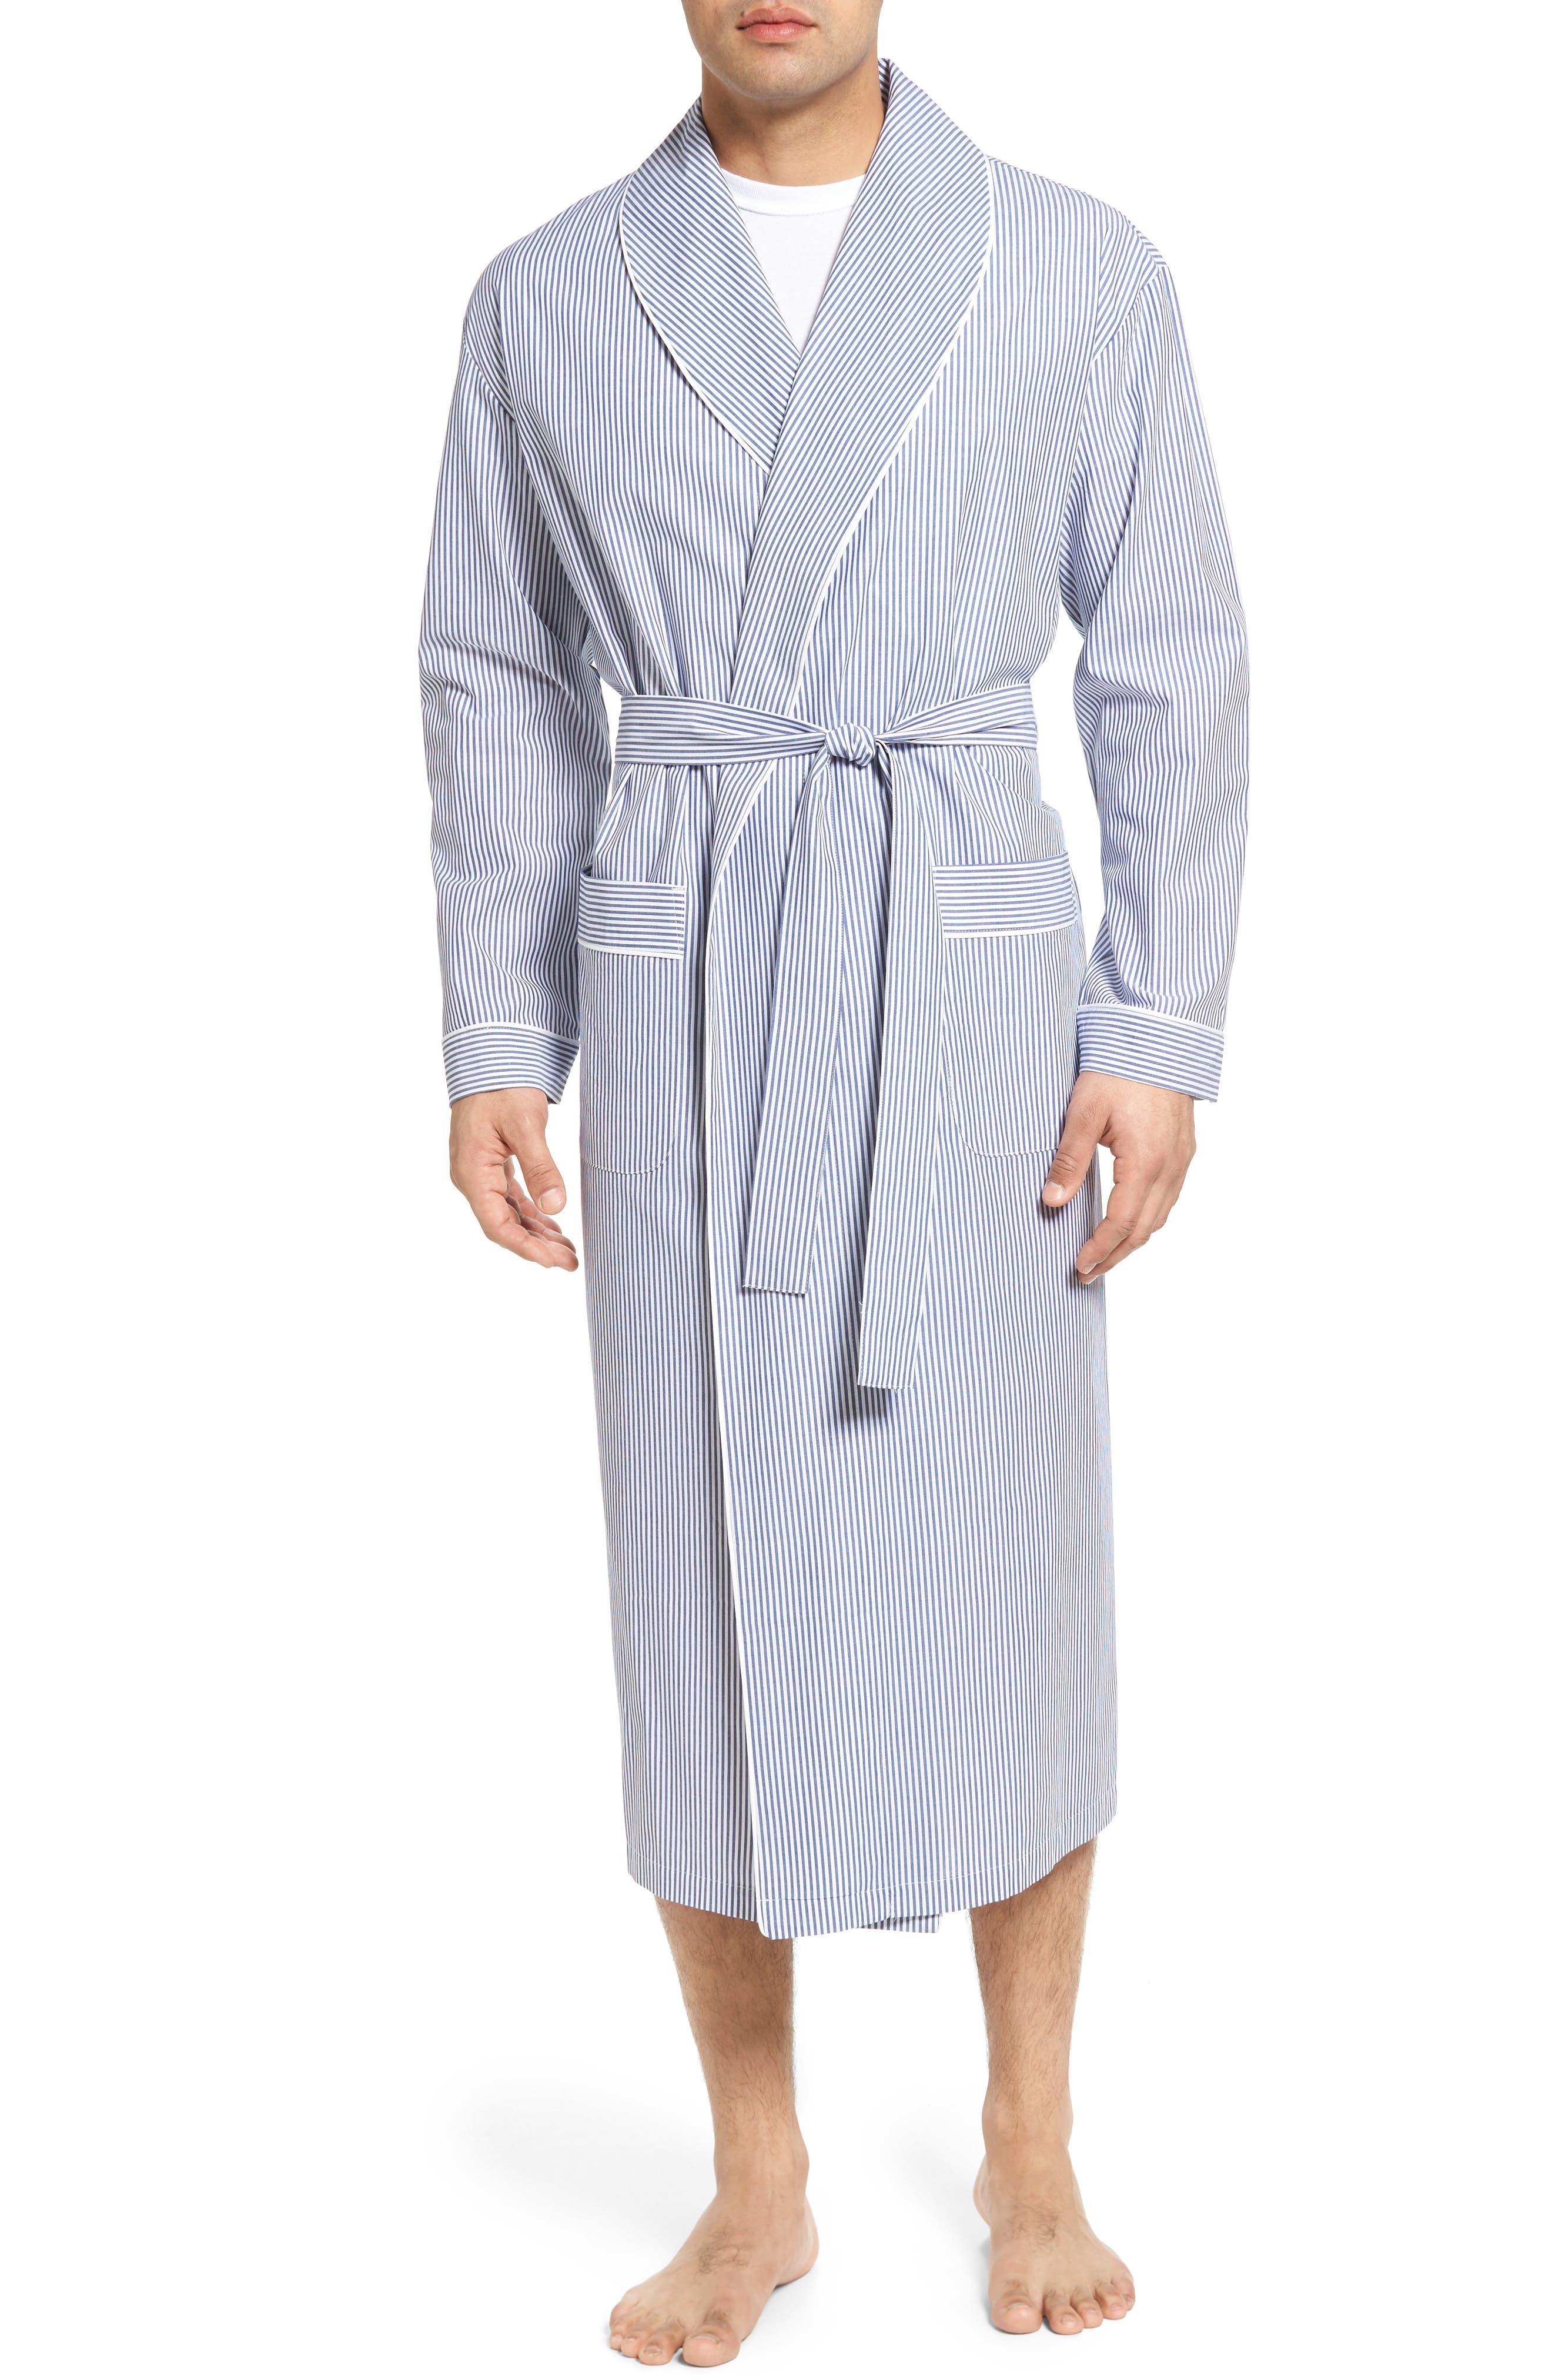 MAJESTIC INTERNATIONAL Bengal Stripe Robe, Main, color, NAVY/ WHITE